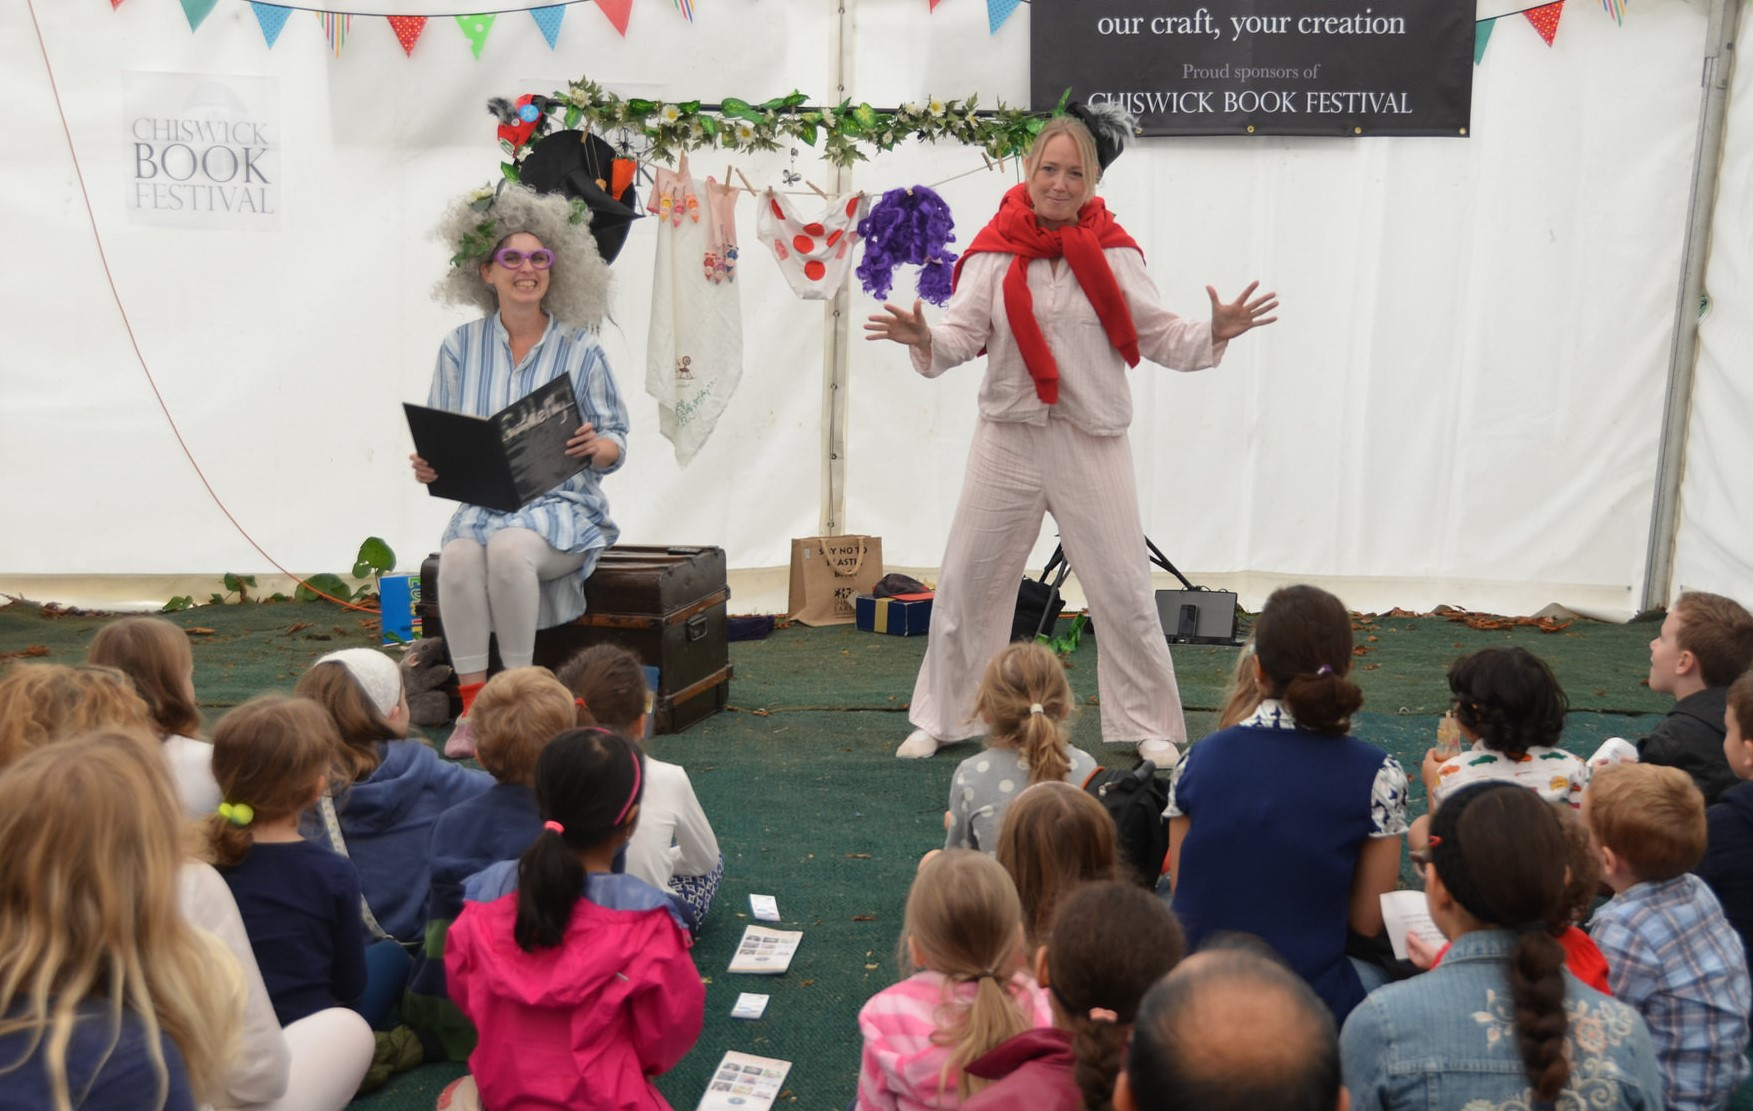 Chiswick Book Fest